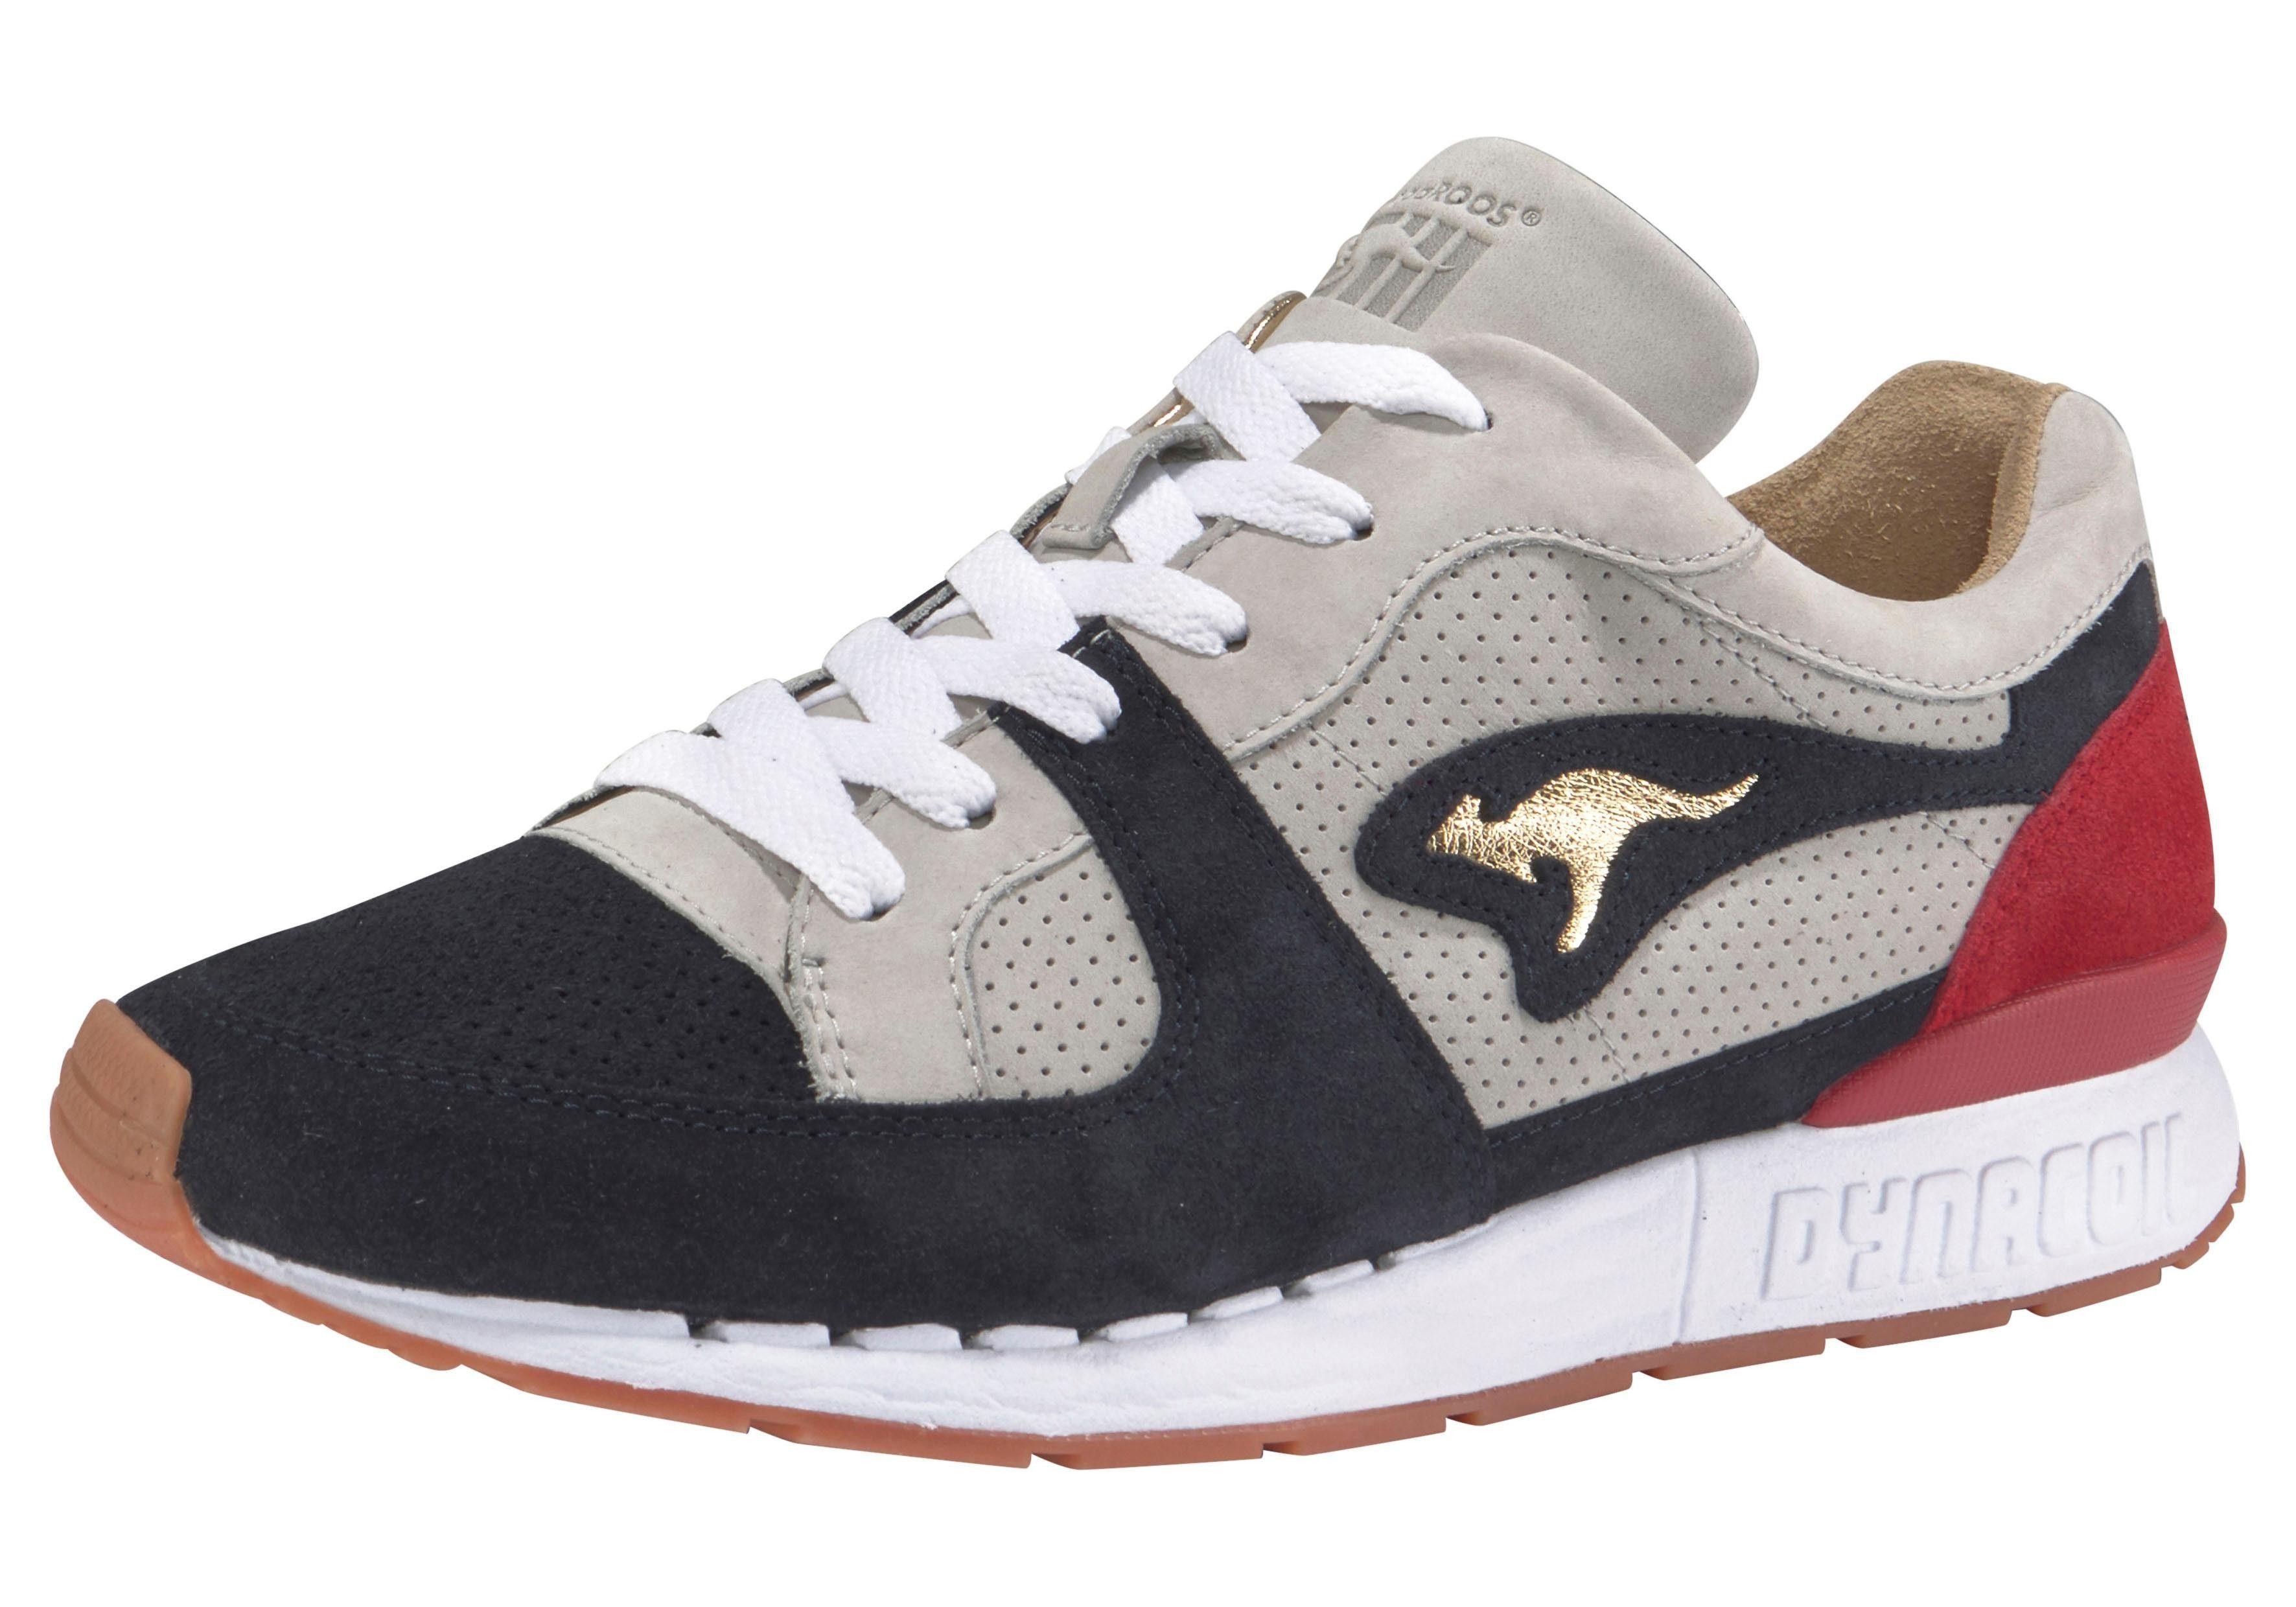 KangaROOS Coil R1 Playmaker Sneaker kaufen  grau-dunkelblau-rot